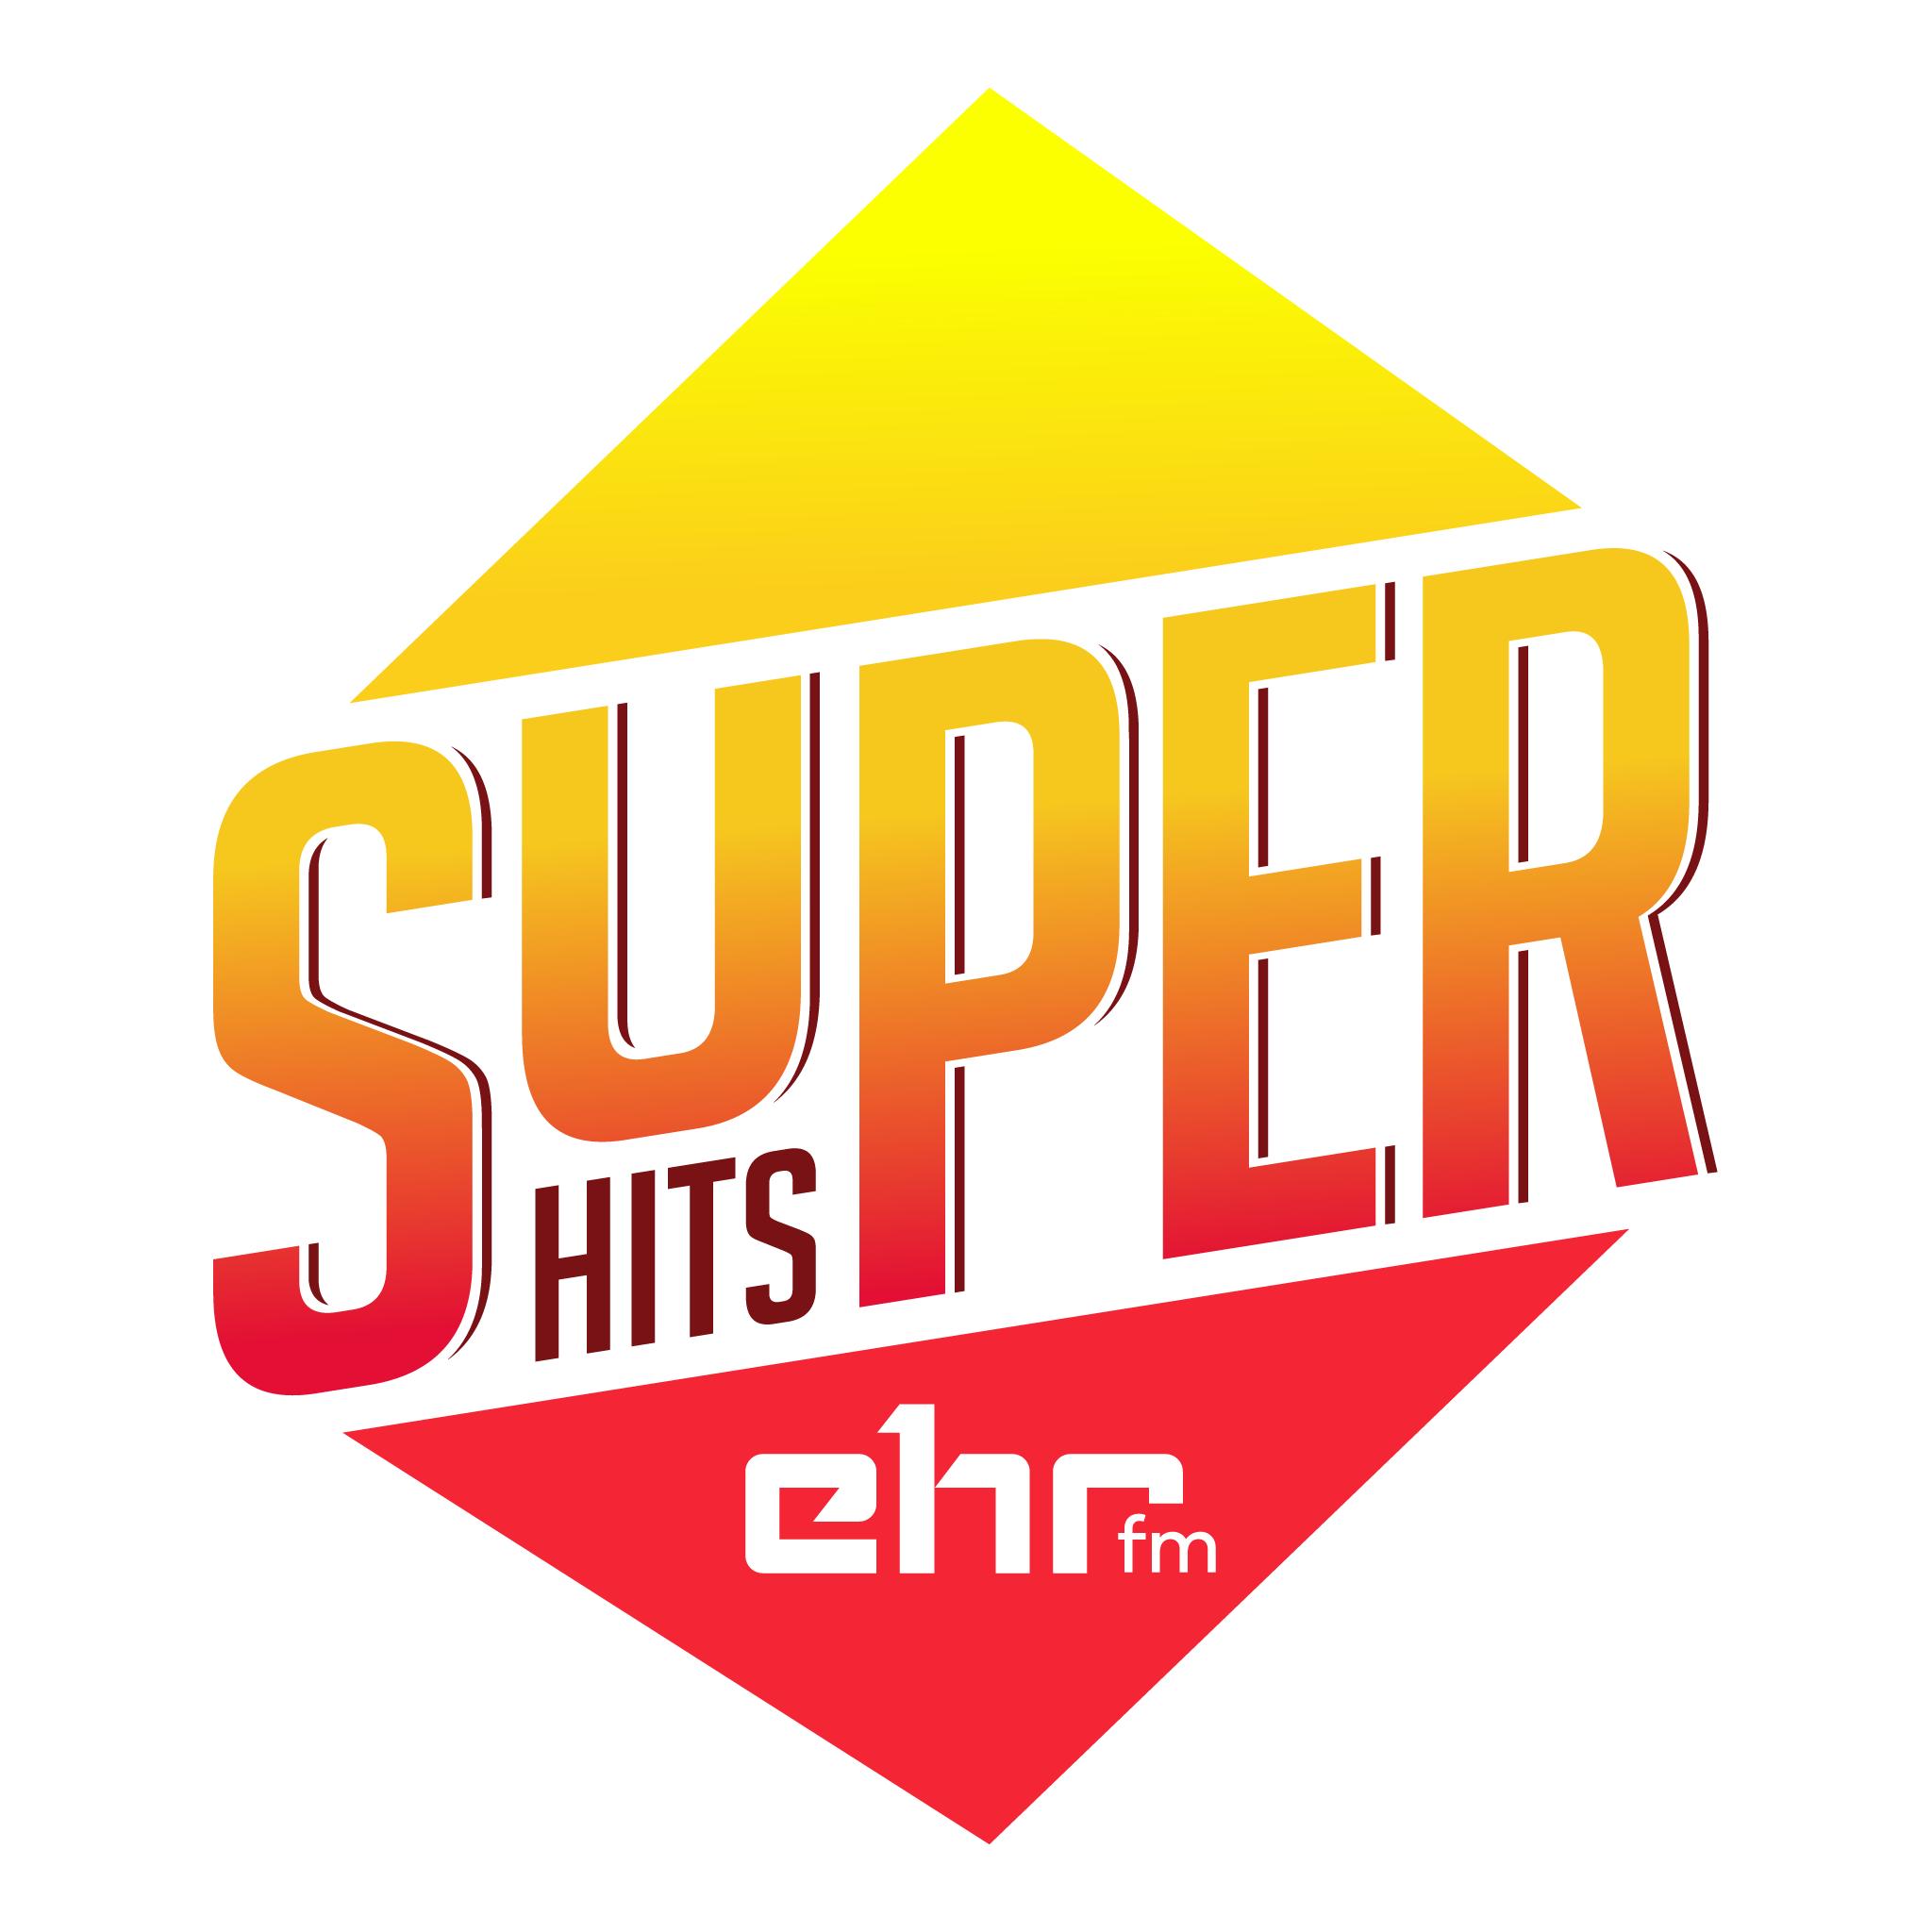 Superhits_logo.png